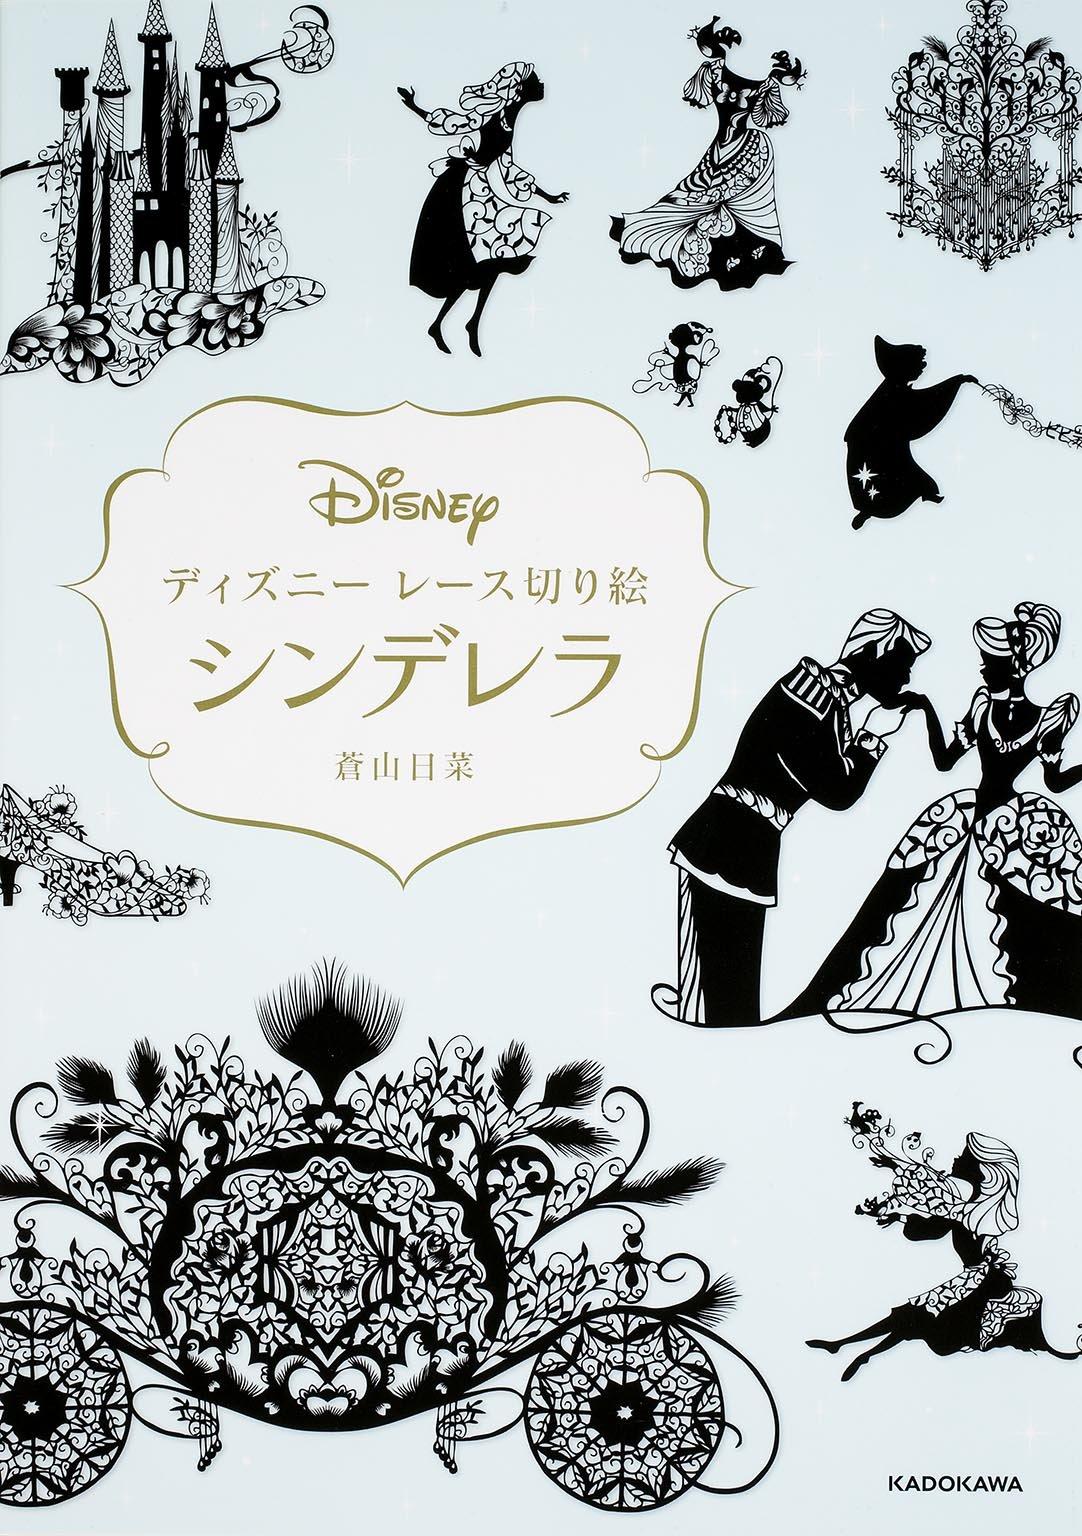 Cinderella Disney Lace Paper Cut of Hina Aoyama